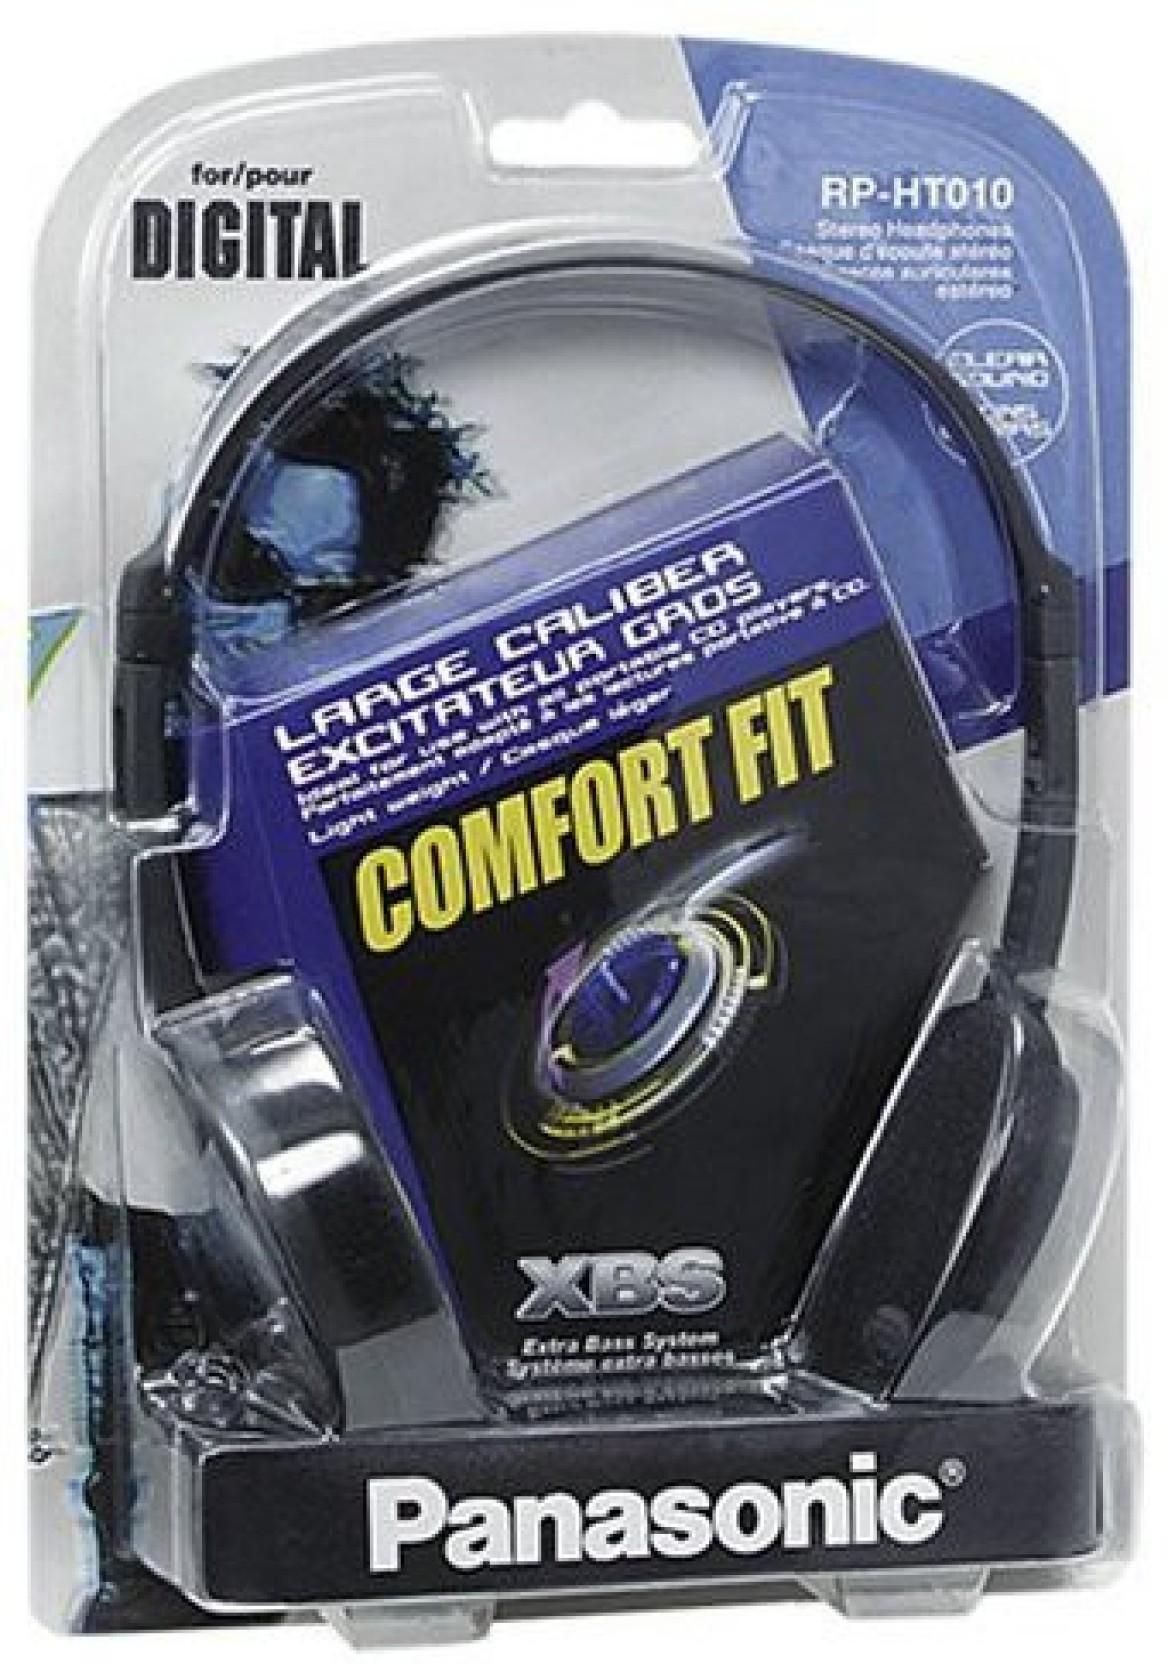 Panasonic Rp-Ht010-H Headphones Comfort Fit Rpht010 /Genuine Headphone. Compare